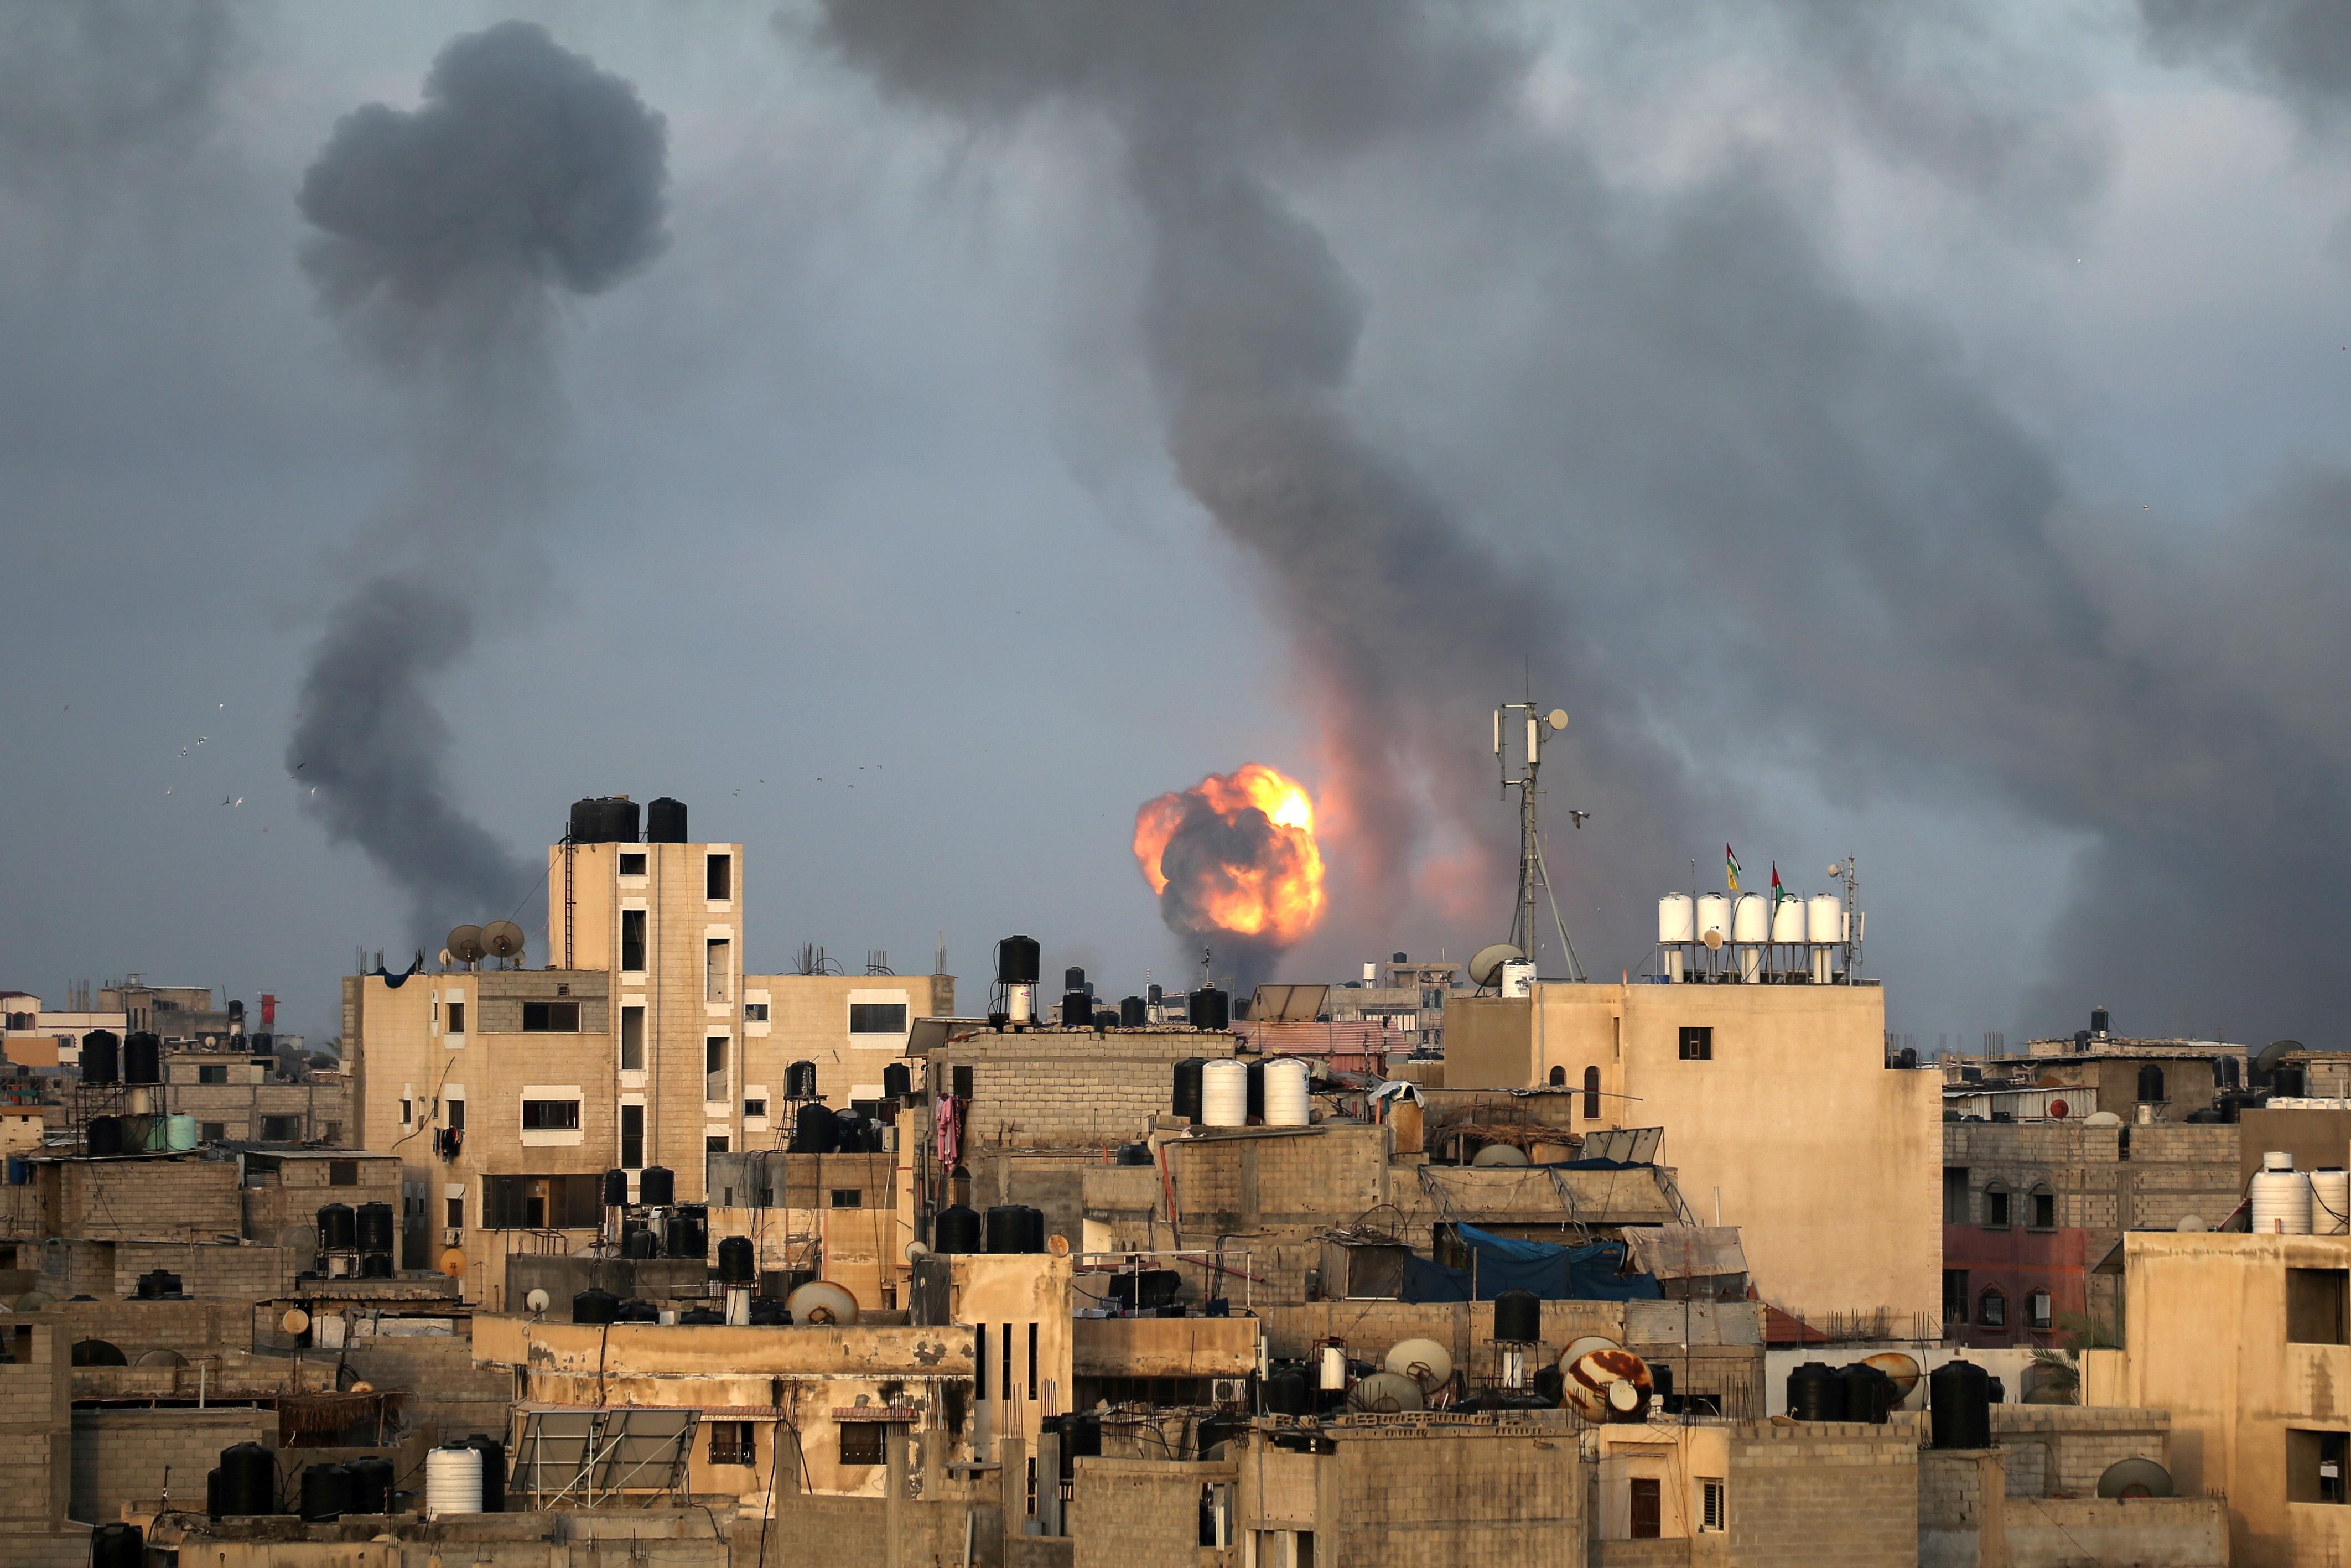 Flames and smoke rise during Israeli air strikes amid a flare-up of Israel-Palestinian violence, in the southern Gaza Strip May 11, 2021. REUTERS/Ibraheem Abu Mustafa